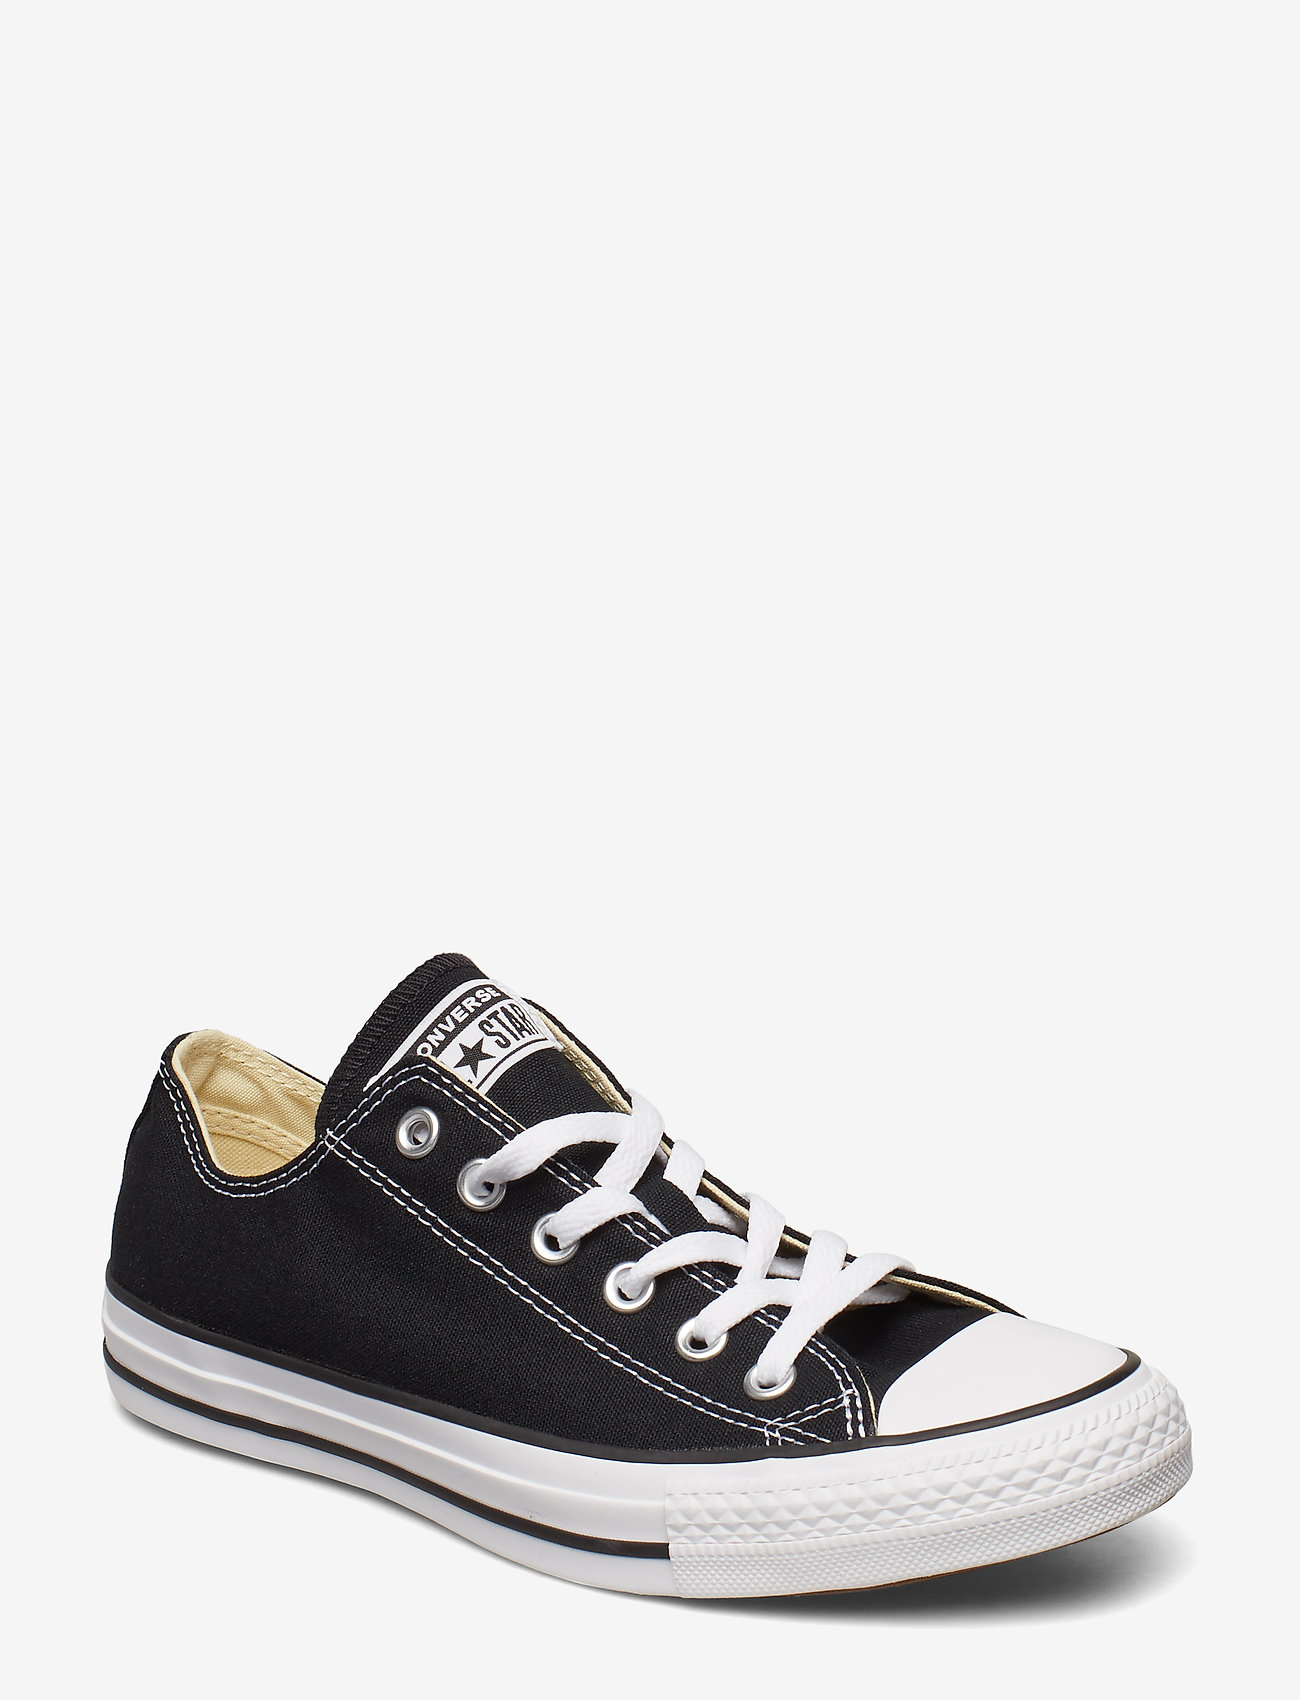 Converse - ALL STAR OX - tenis - black